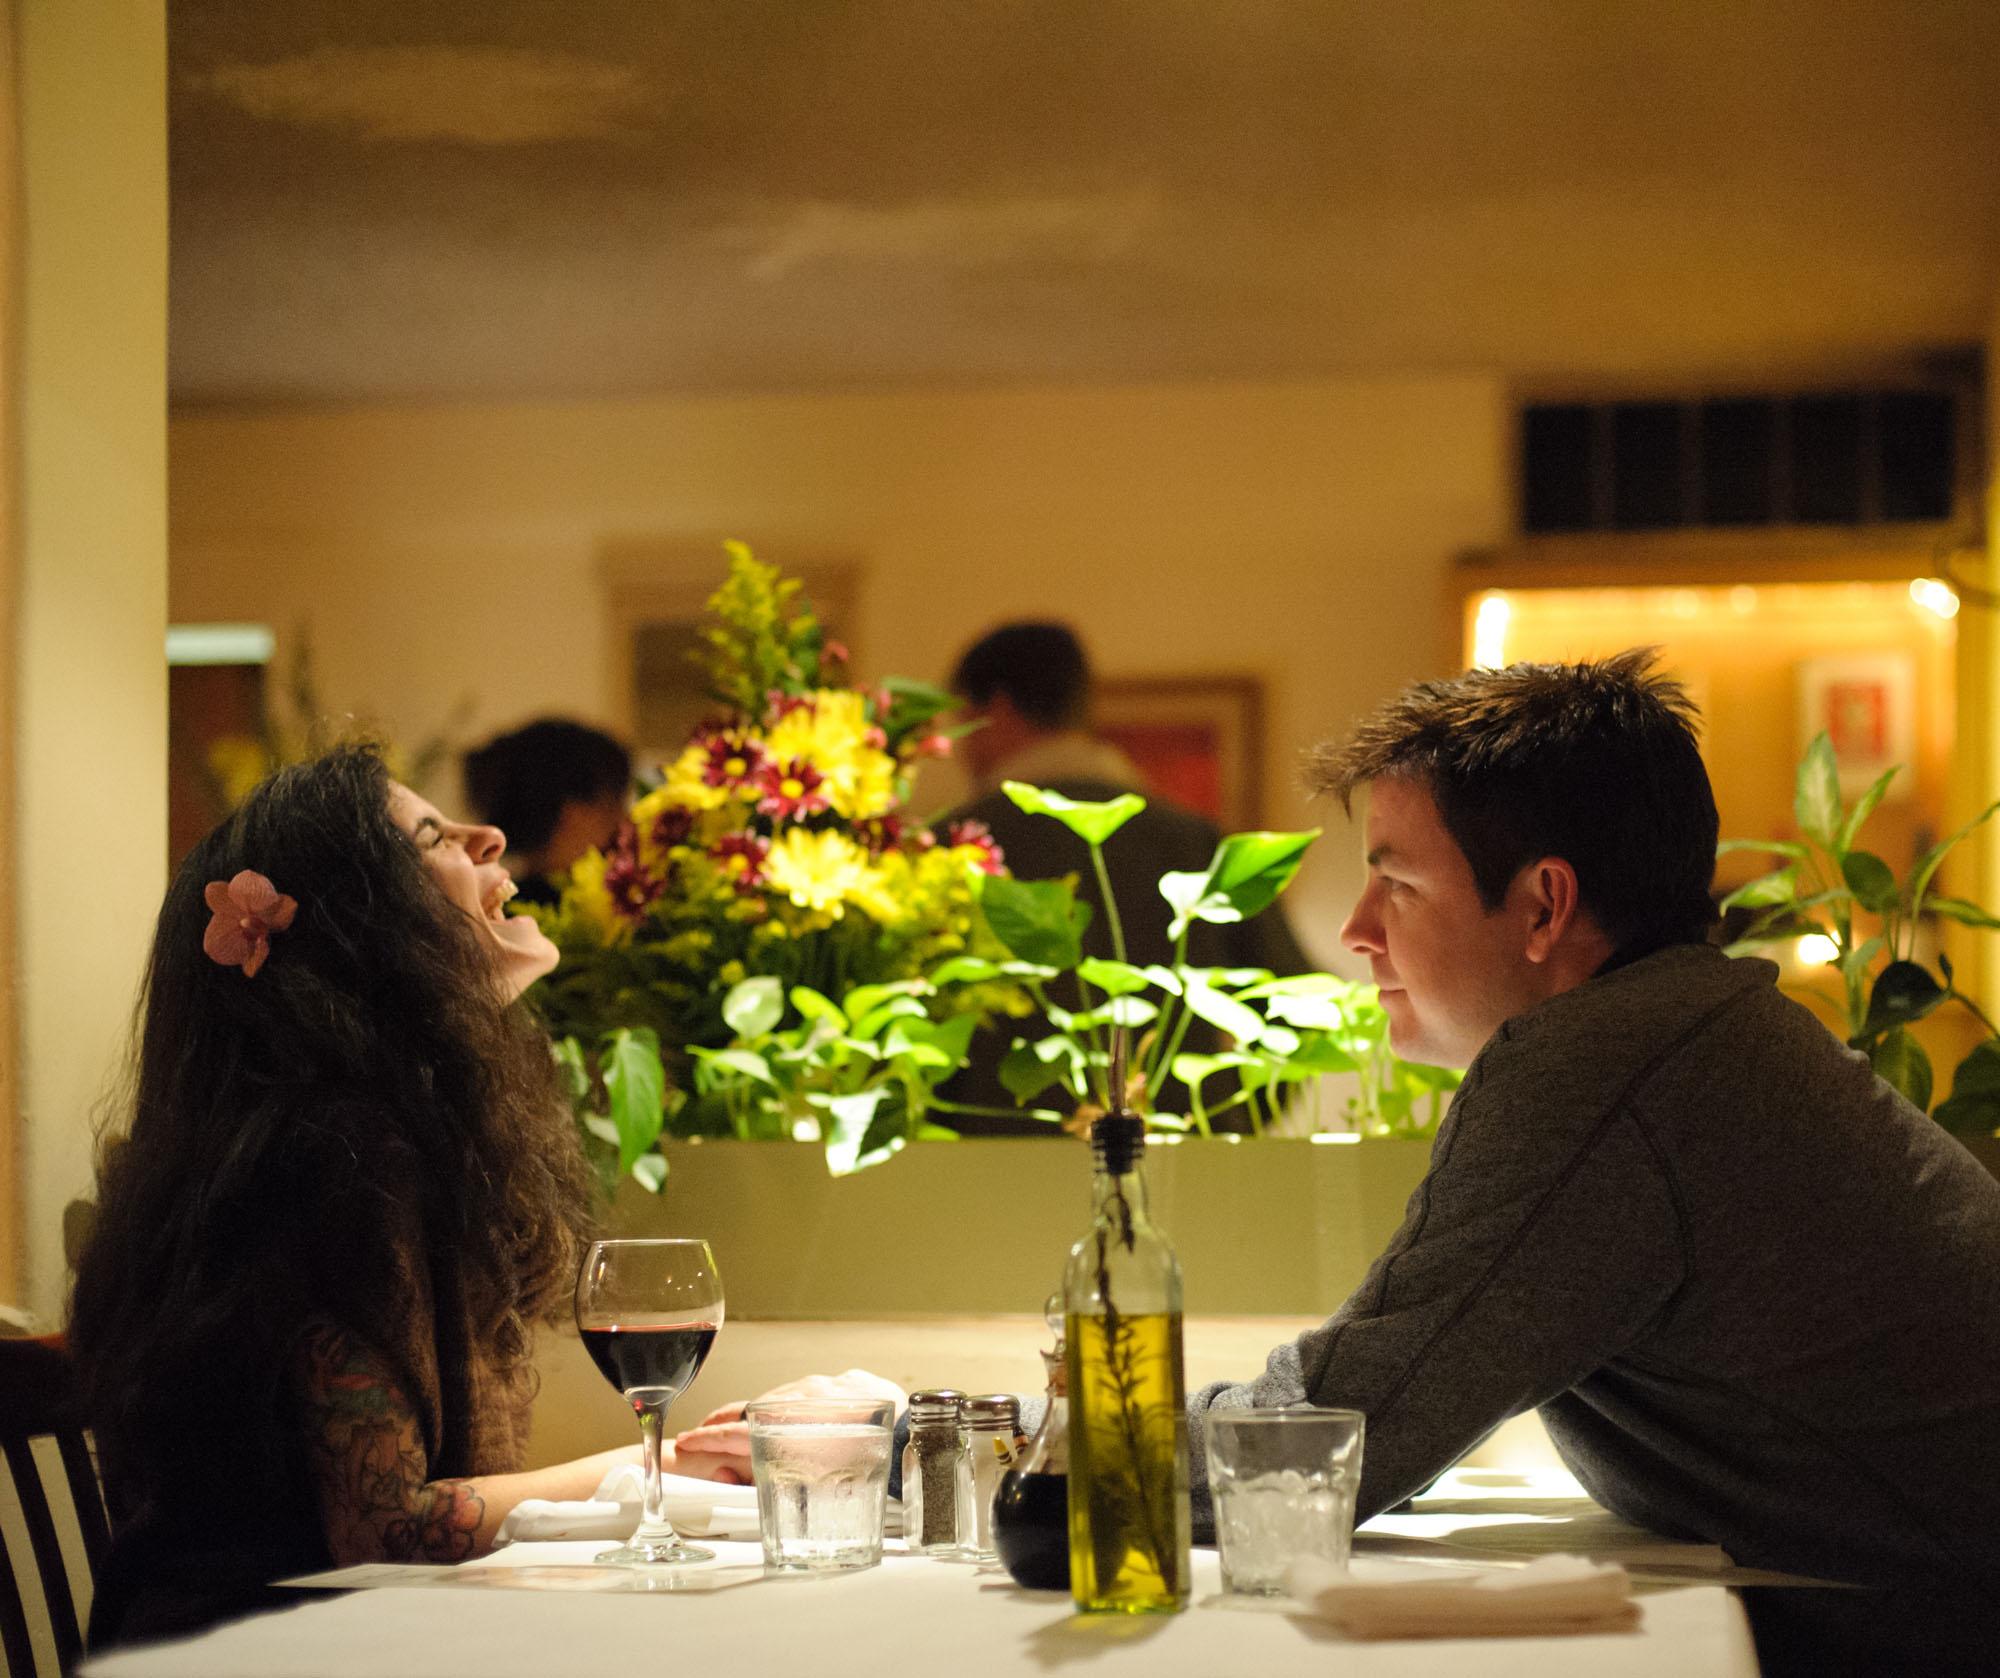 6478-Cruz_Cafe_Soquel_Restaurant_Photography_d700.jpg